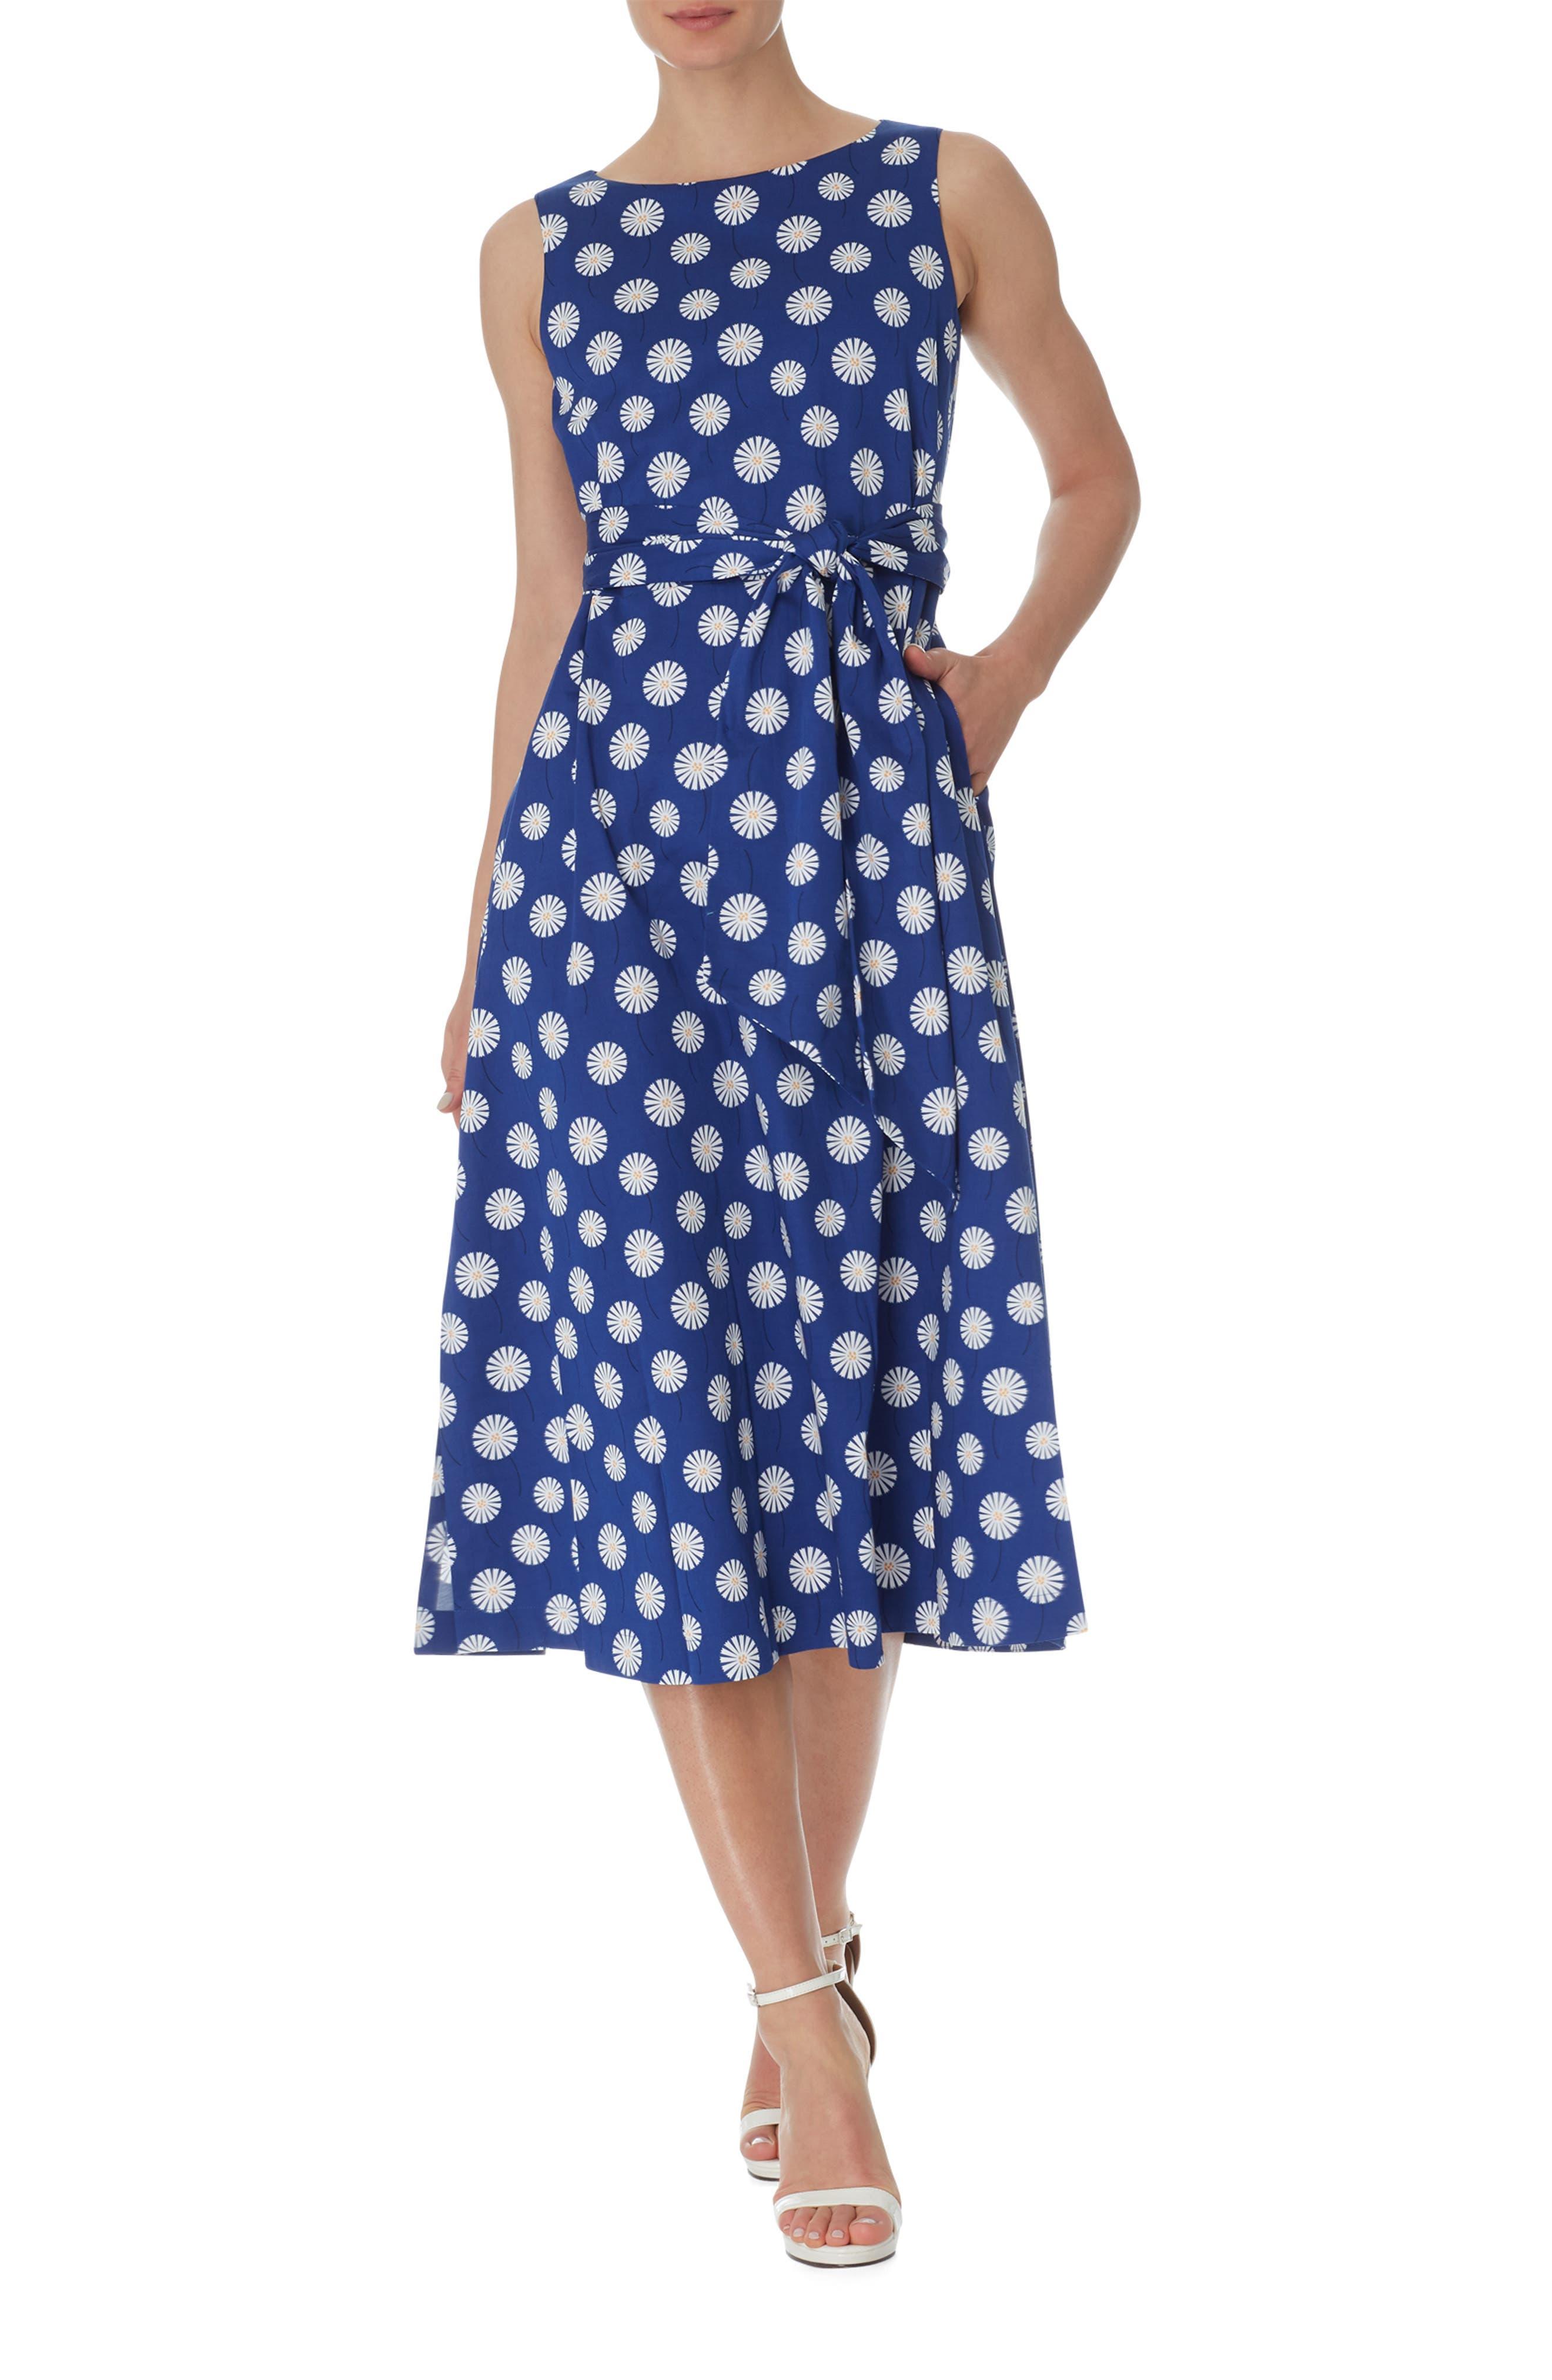 Daisy Print Stretch Cotton Midi Dress